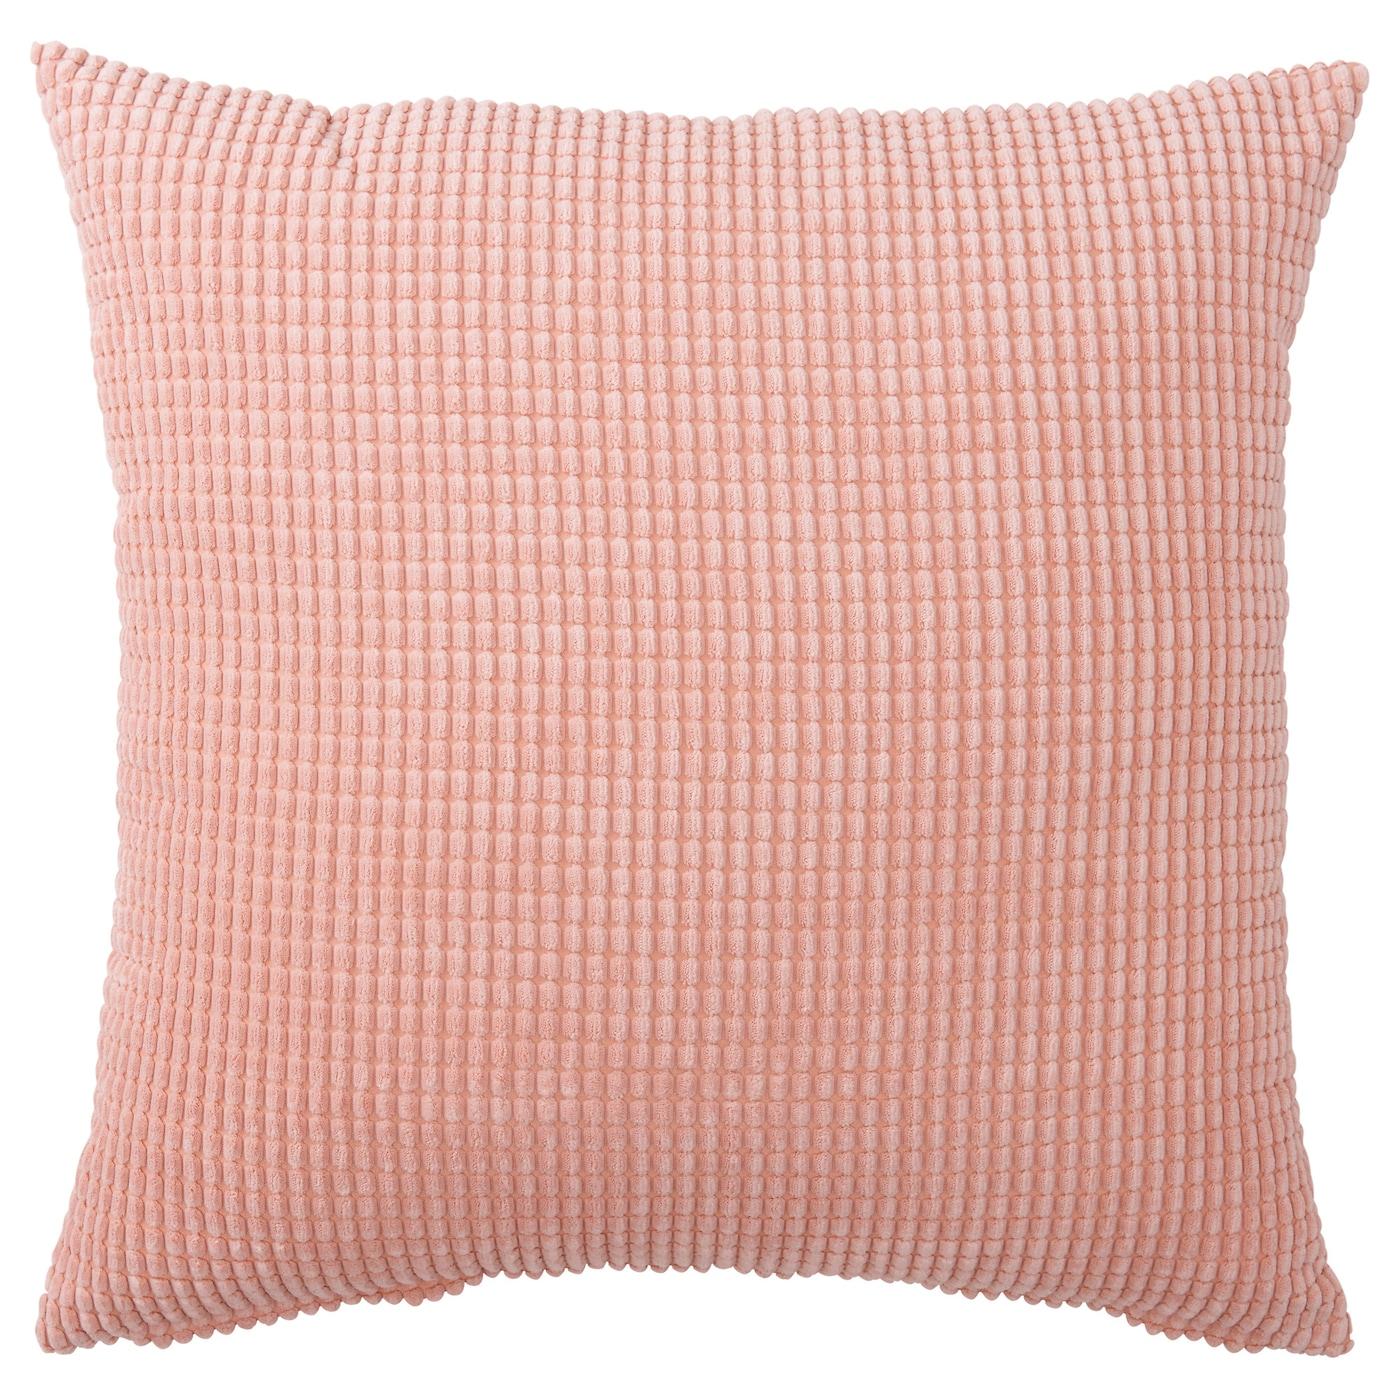 GULLKLOCKA Fodera per cuscino - rosa - IKEA